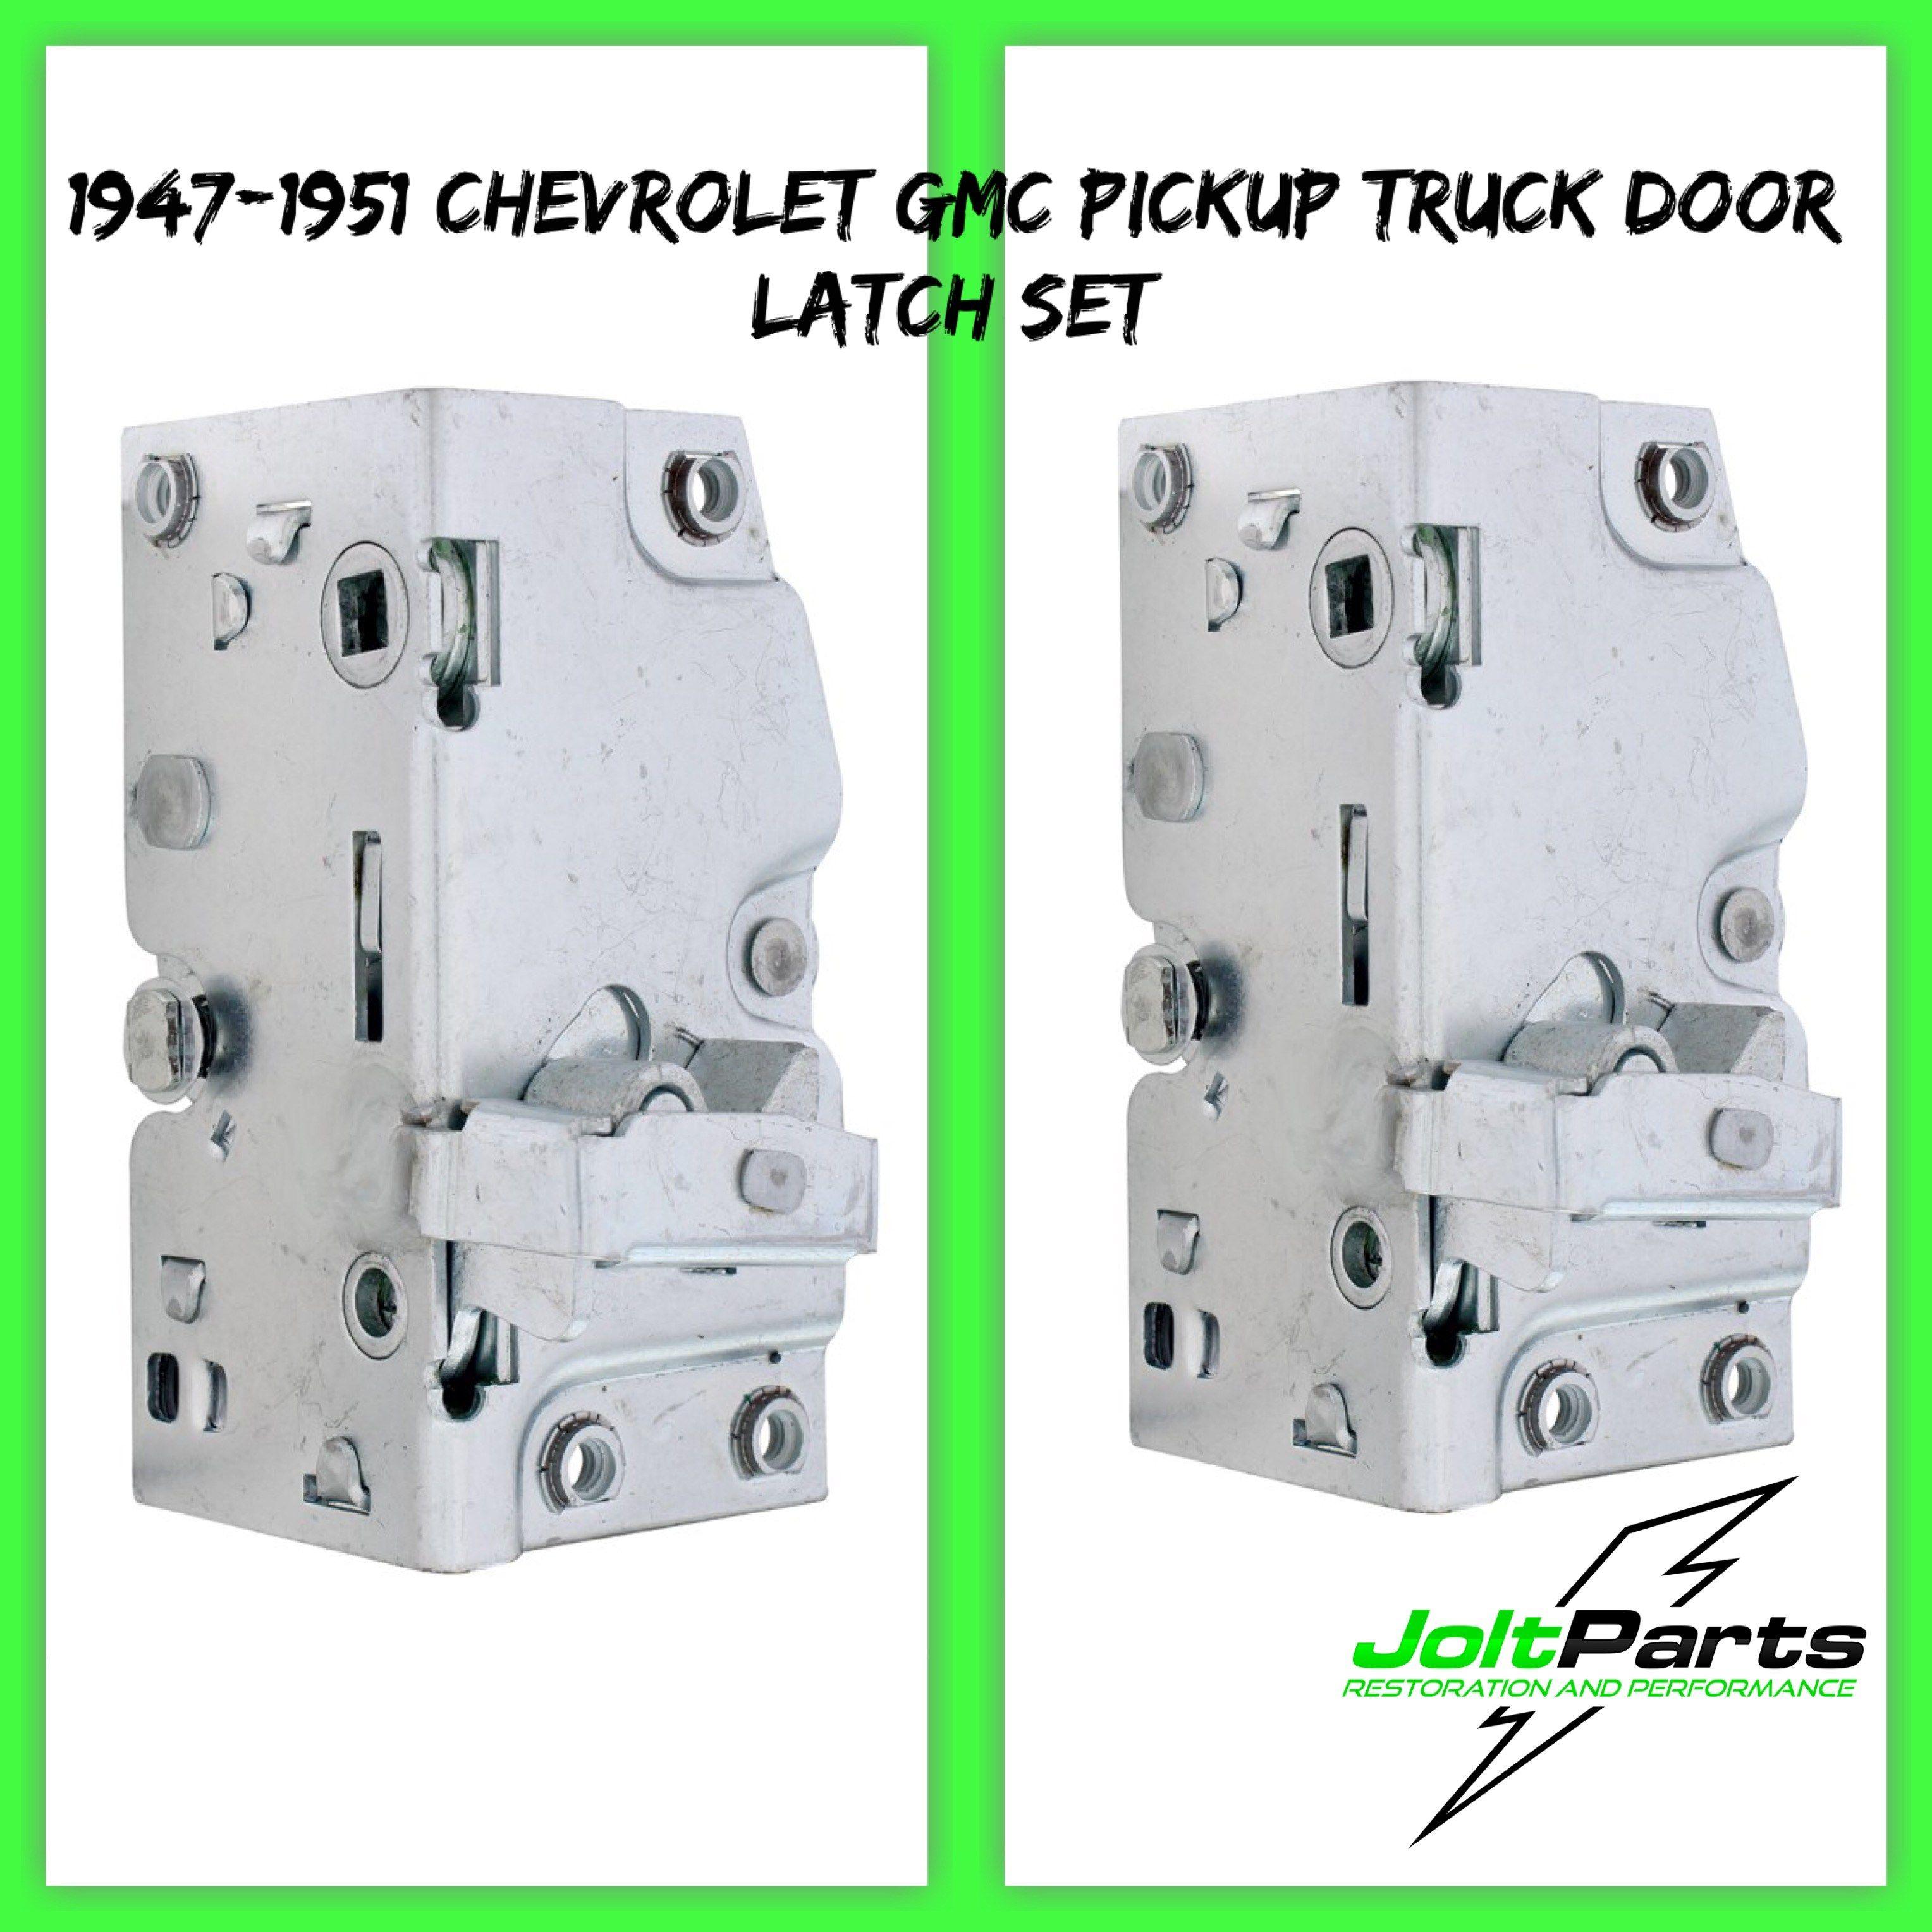 United Pacific 110186 87 1947 1951 Chevy Gmc Pickup Truck Door Latch Set Gmc Pickup Trucks Pickup Trucks Gmc Pickup